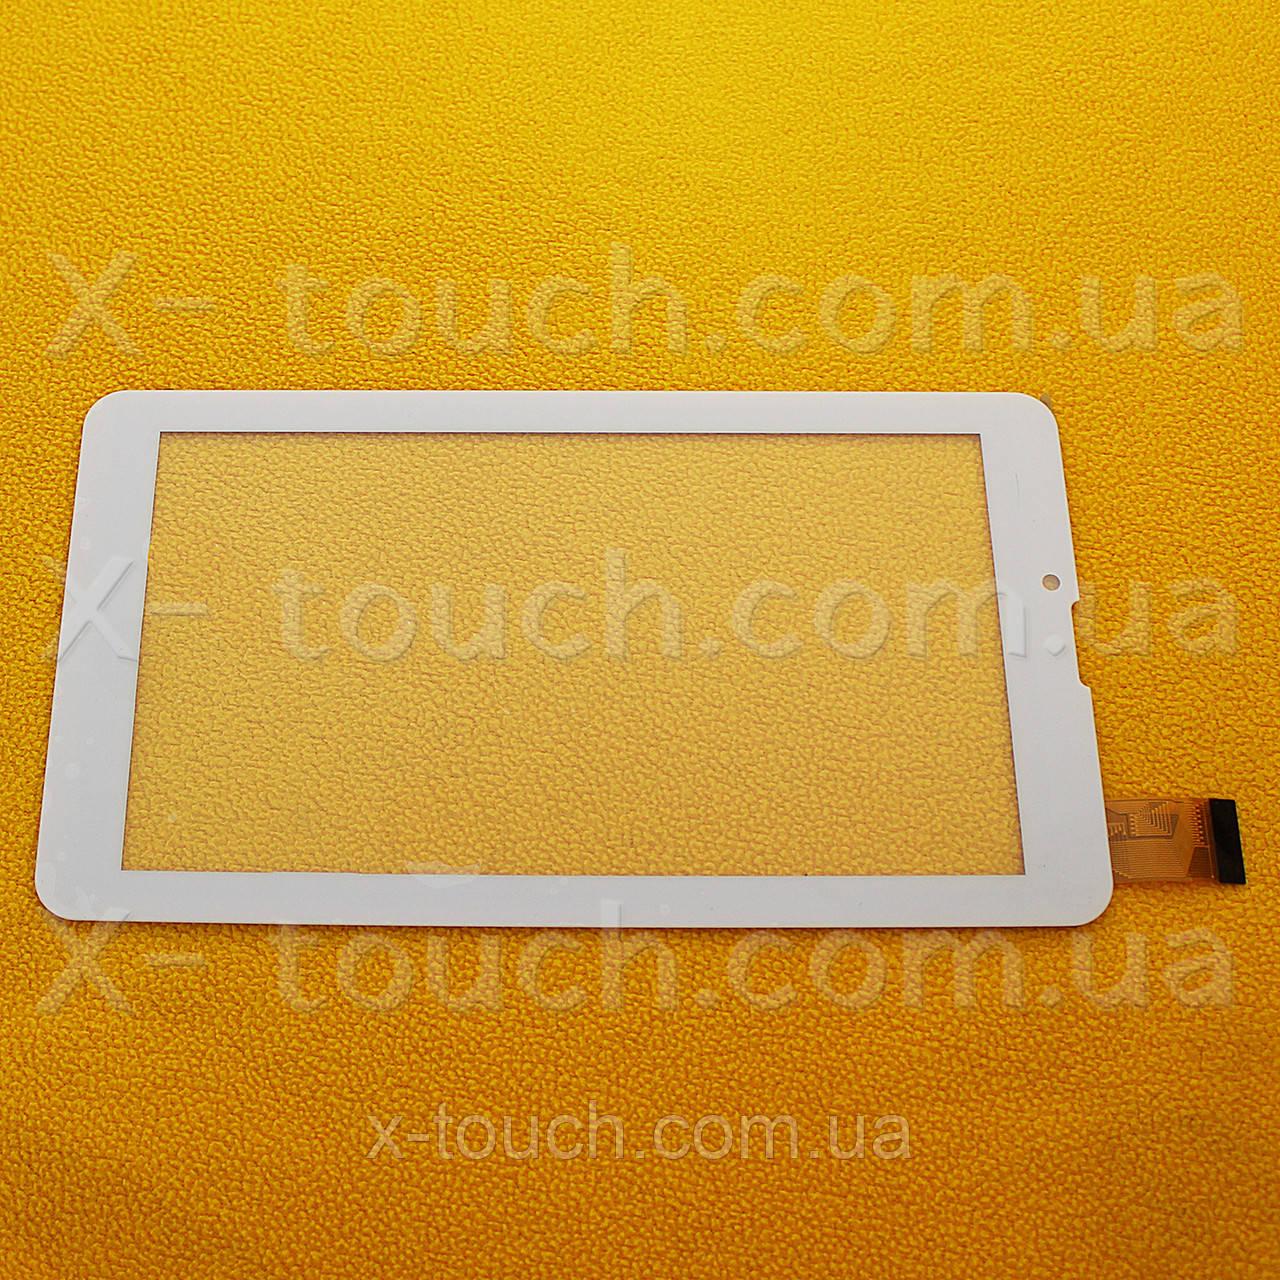 Prestigio MultiPad PMT3087 3G cенсор, тачскрин 7,0 дюймов, цве